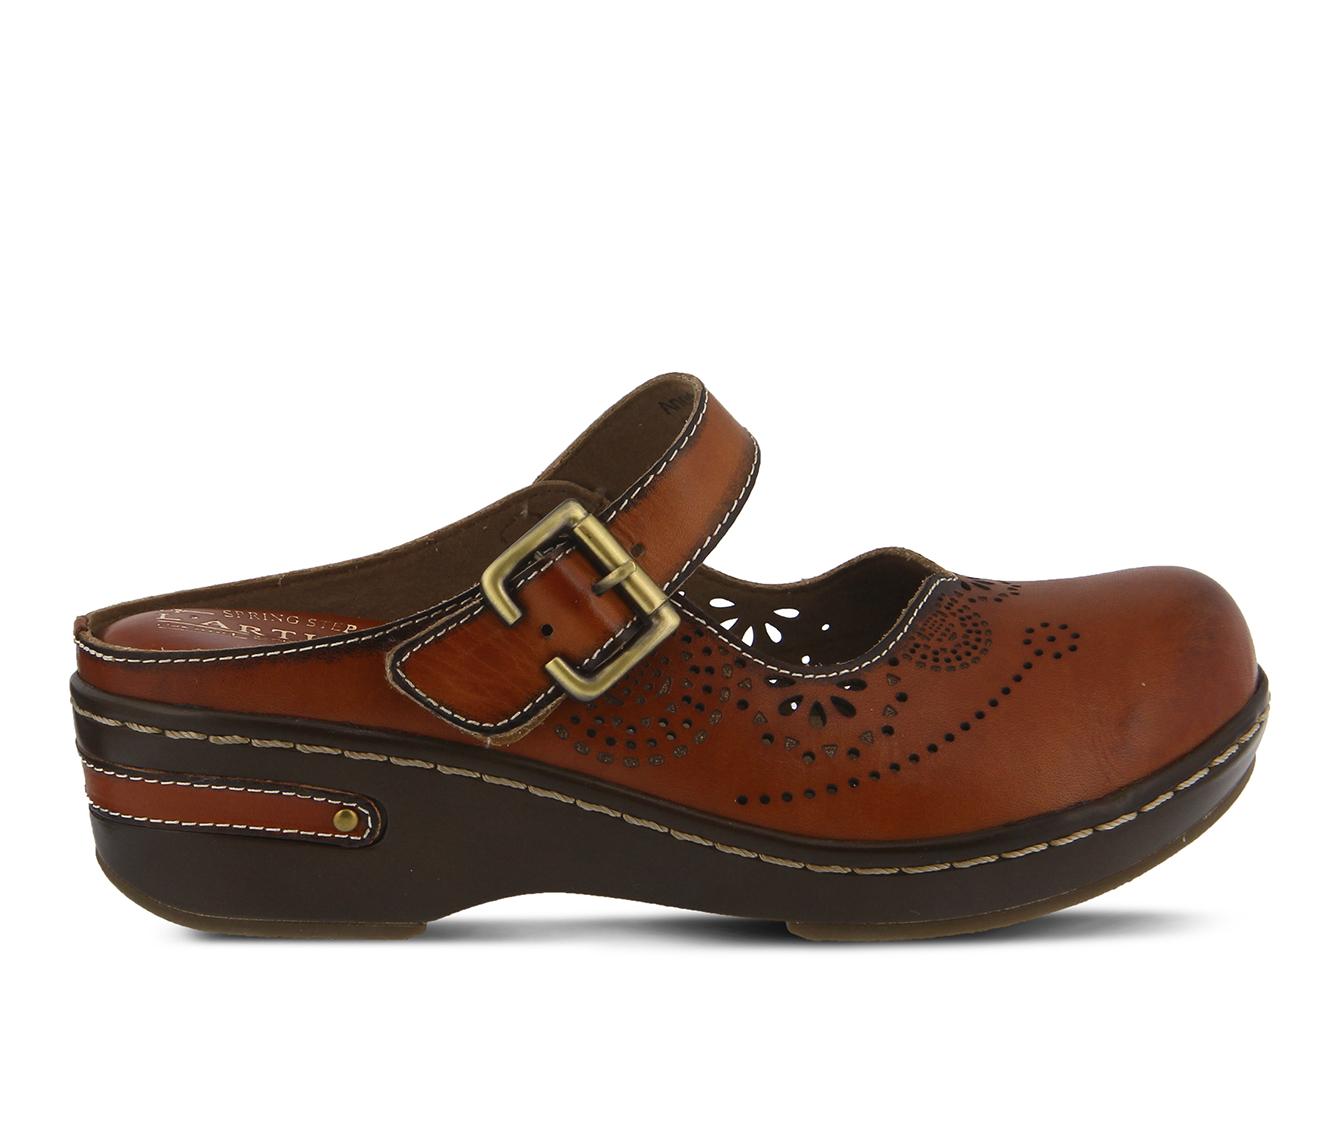 L'Artiste Aneria Women's Shoe (Brown Leather)